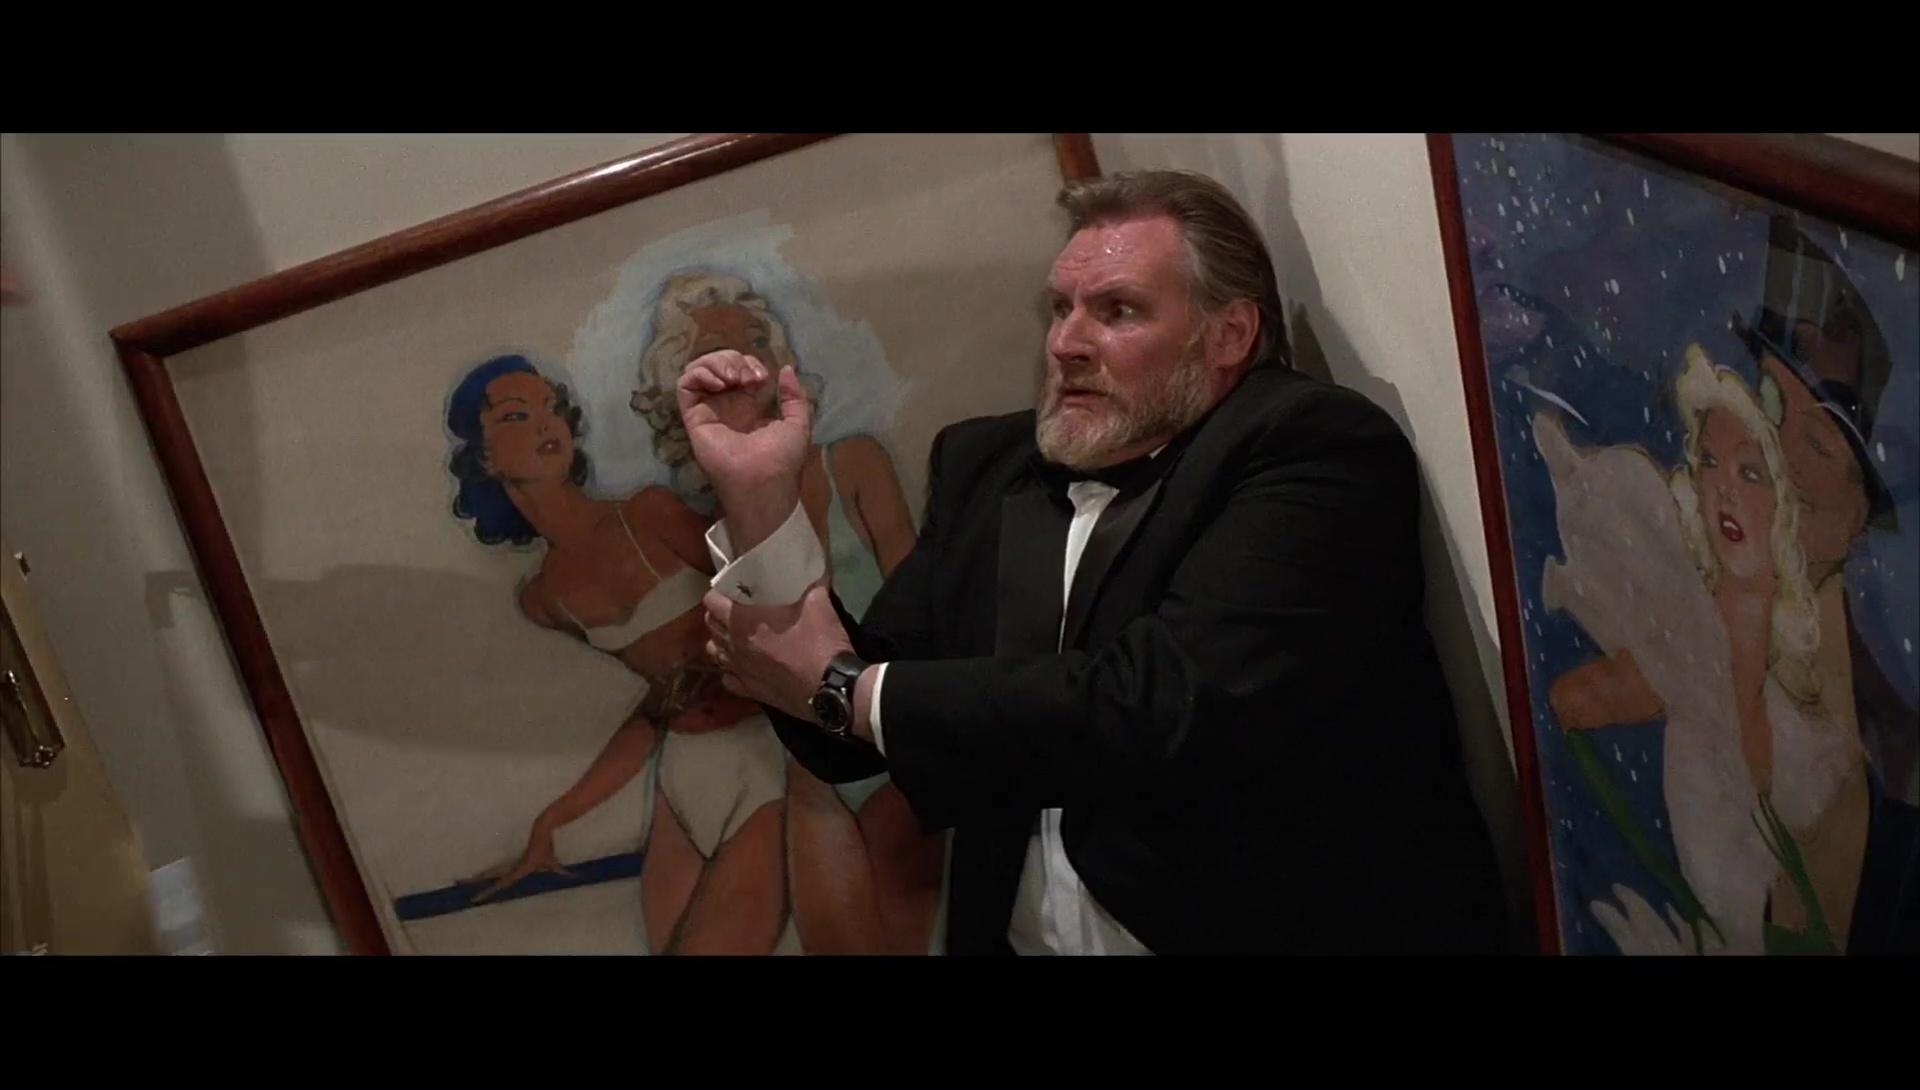 Nunca Digas Nunca Jamas 1080p Lat-Cast-Ing 5.1 (1983)